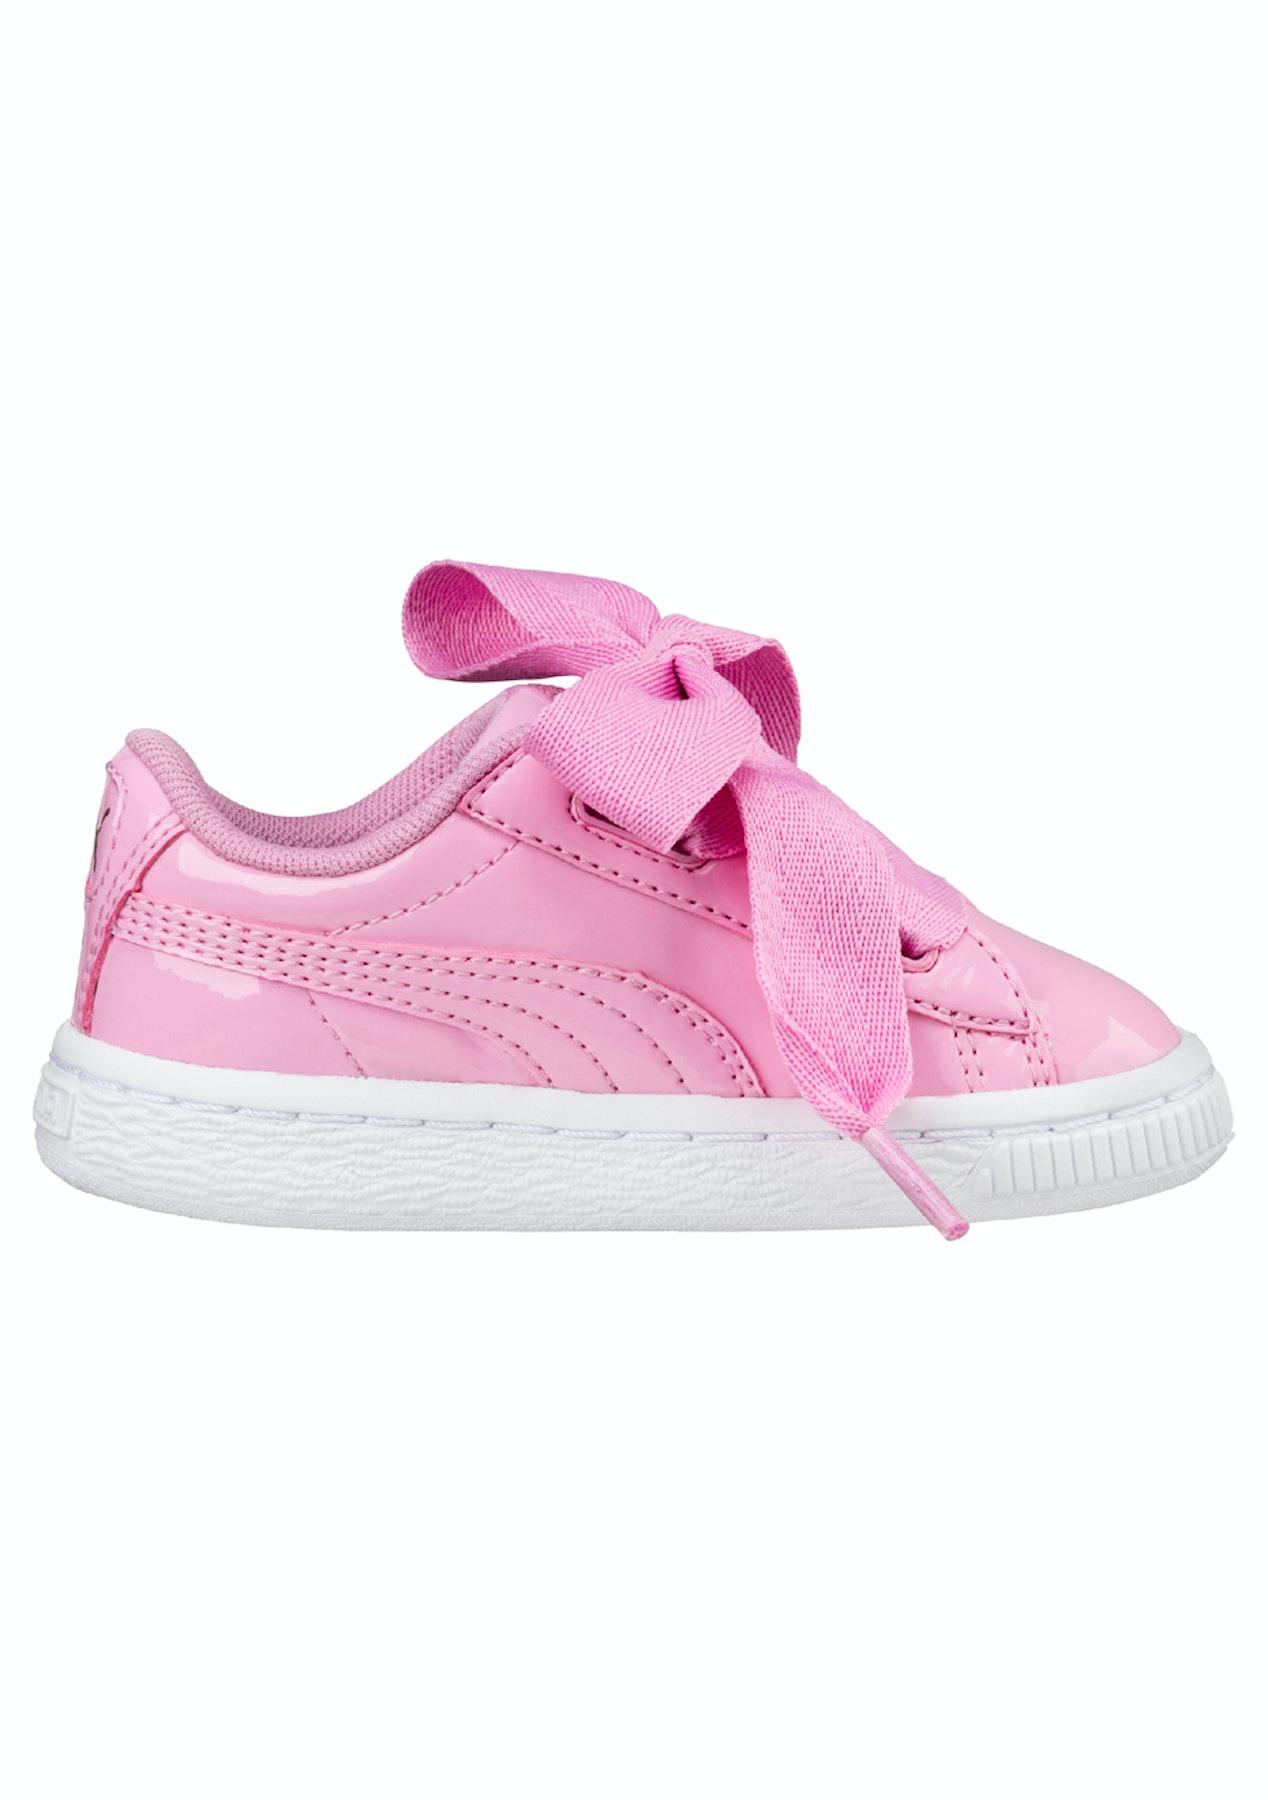 new style 5853e c10a4 Puma Infant - Basket Heart Patent - Pink